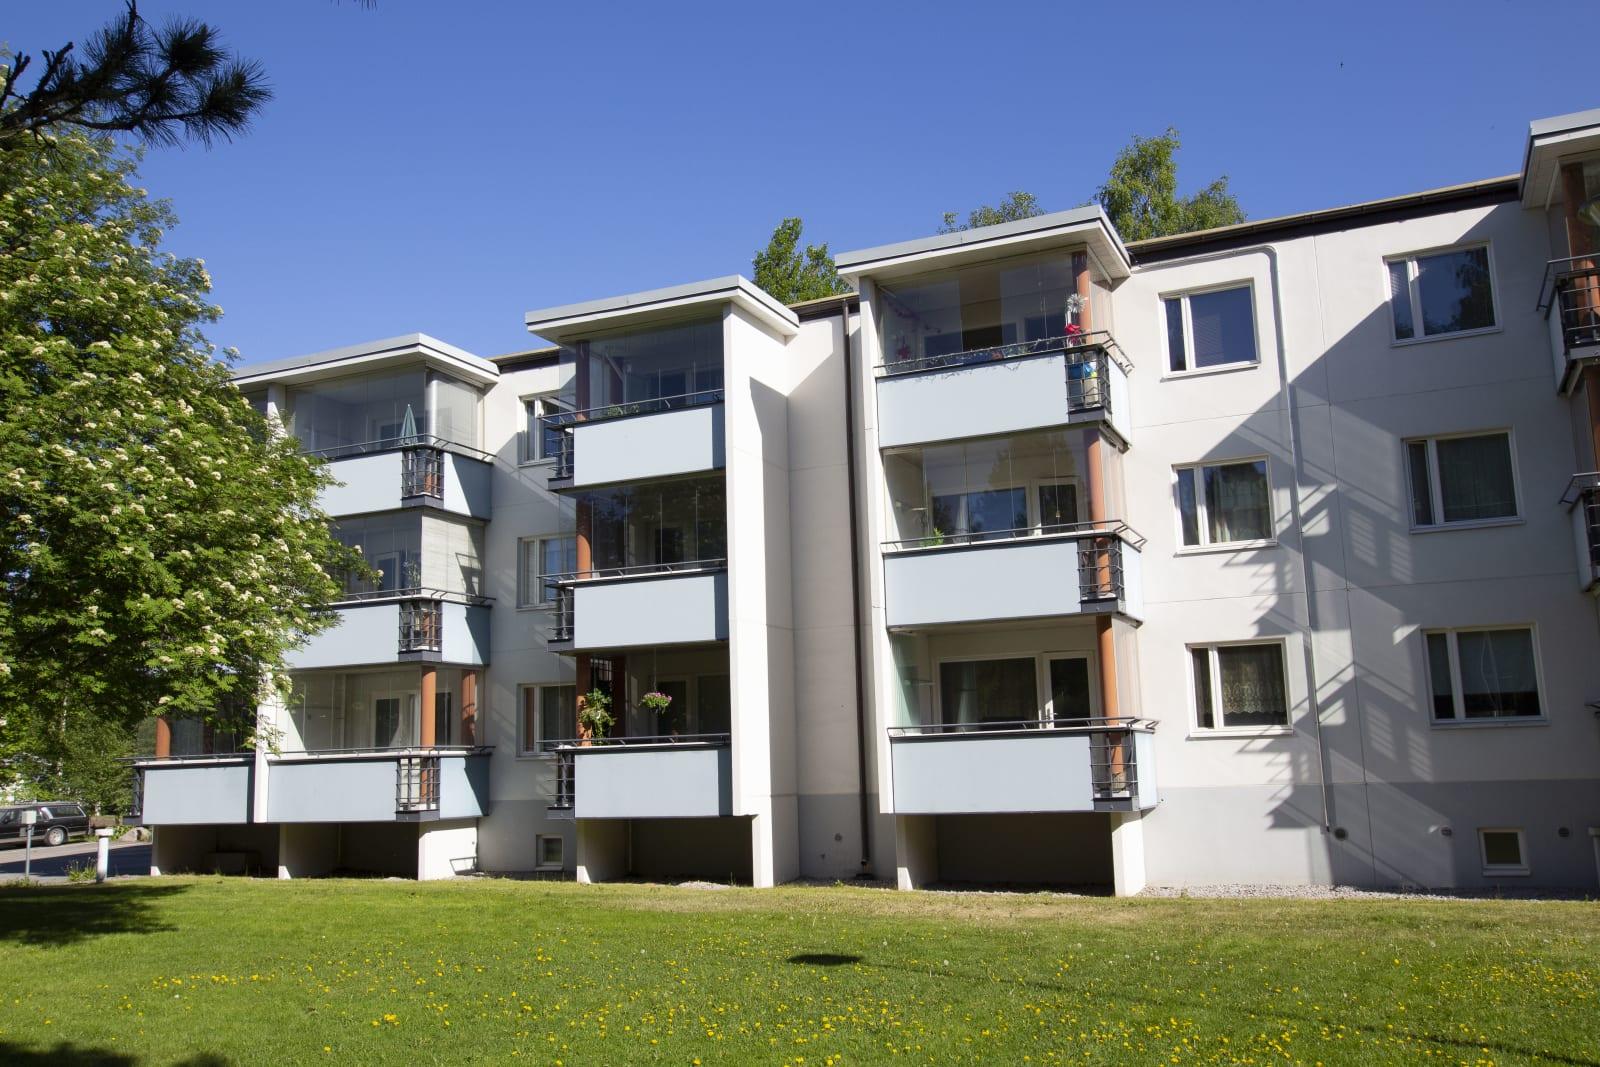 Tampere, Tohloppi, Suoniemenkatu 2-4